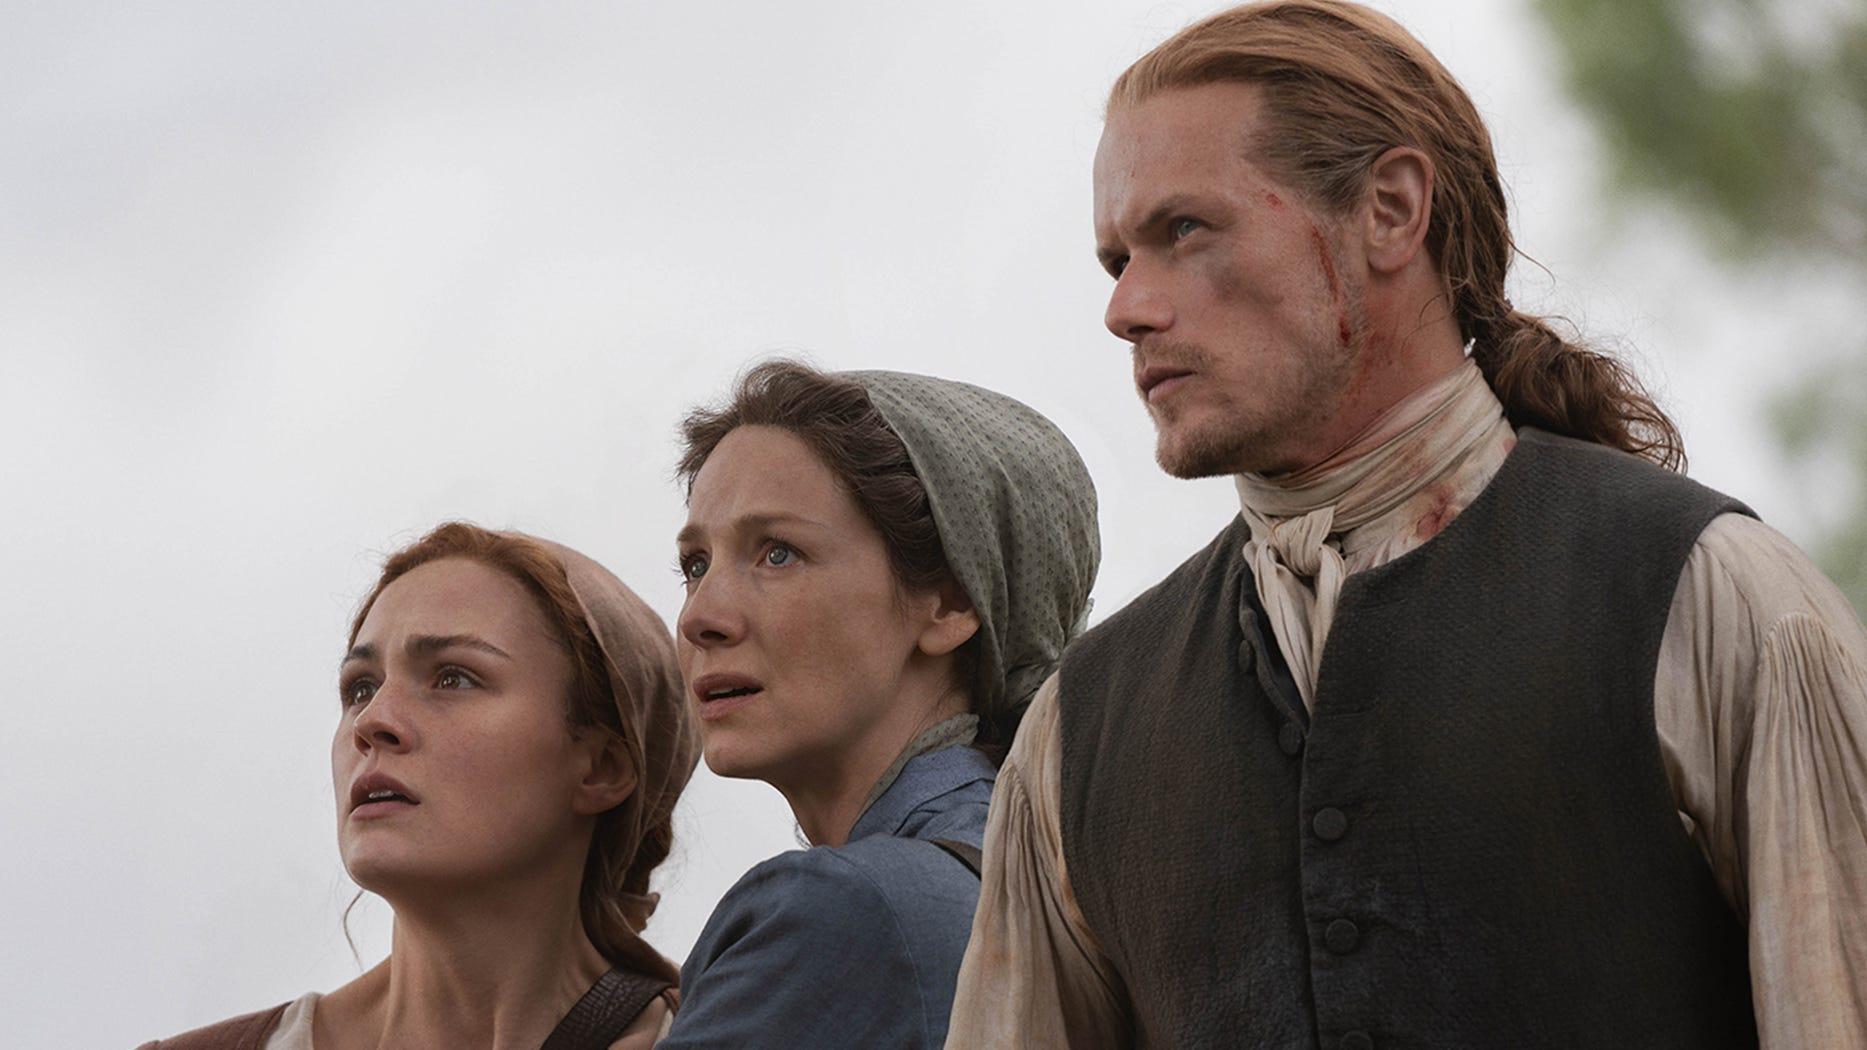 Sophie Skelton, Caitriona Balfe, and Sam Heughan, Outlander